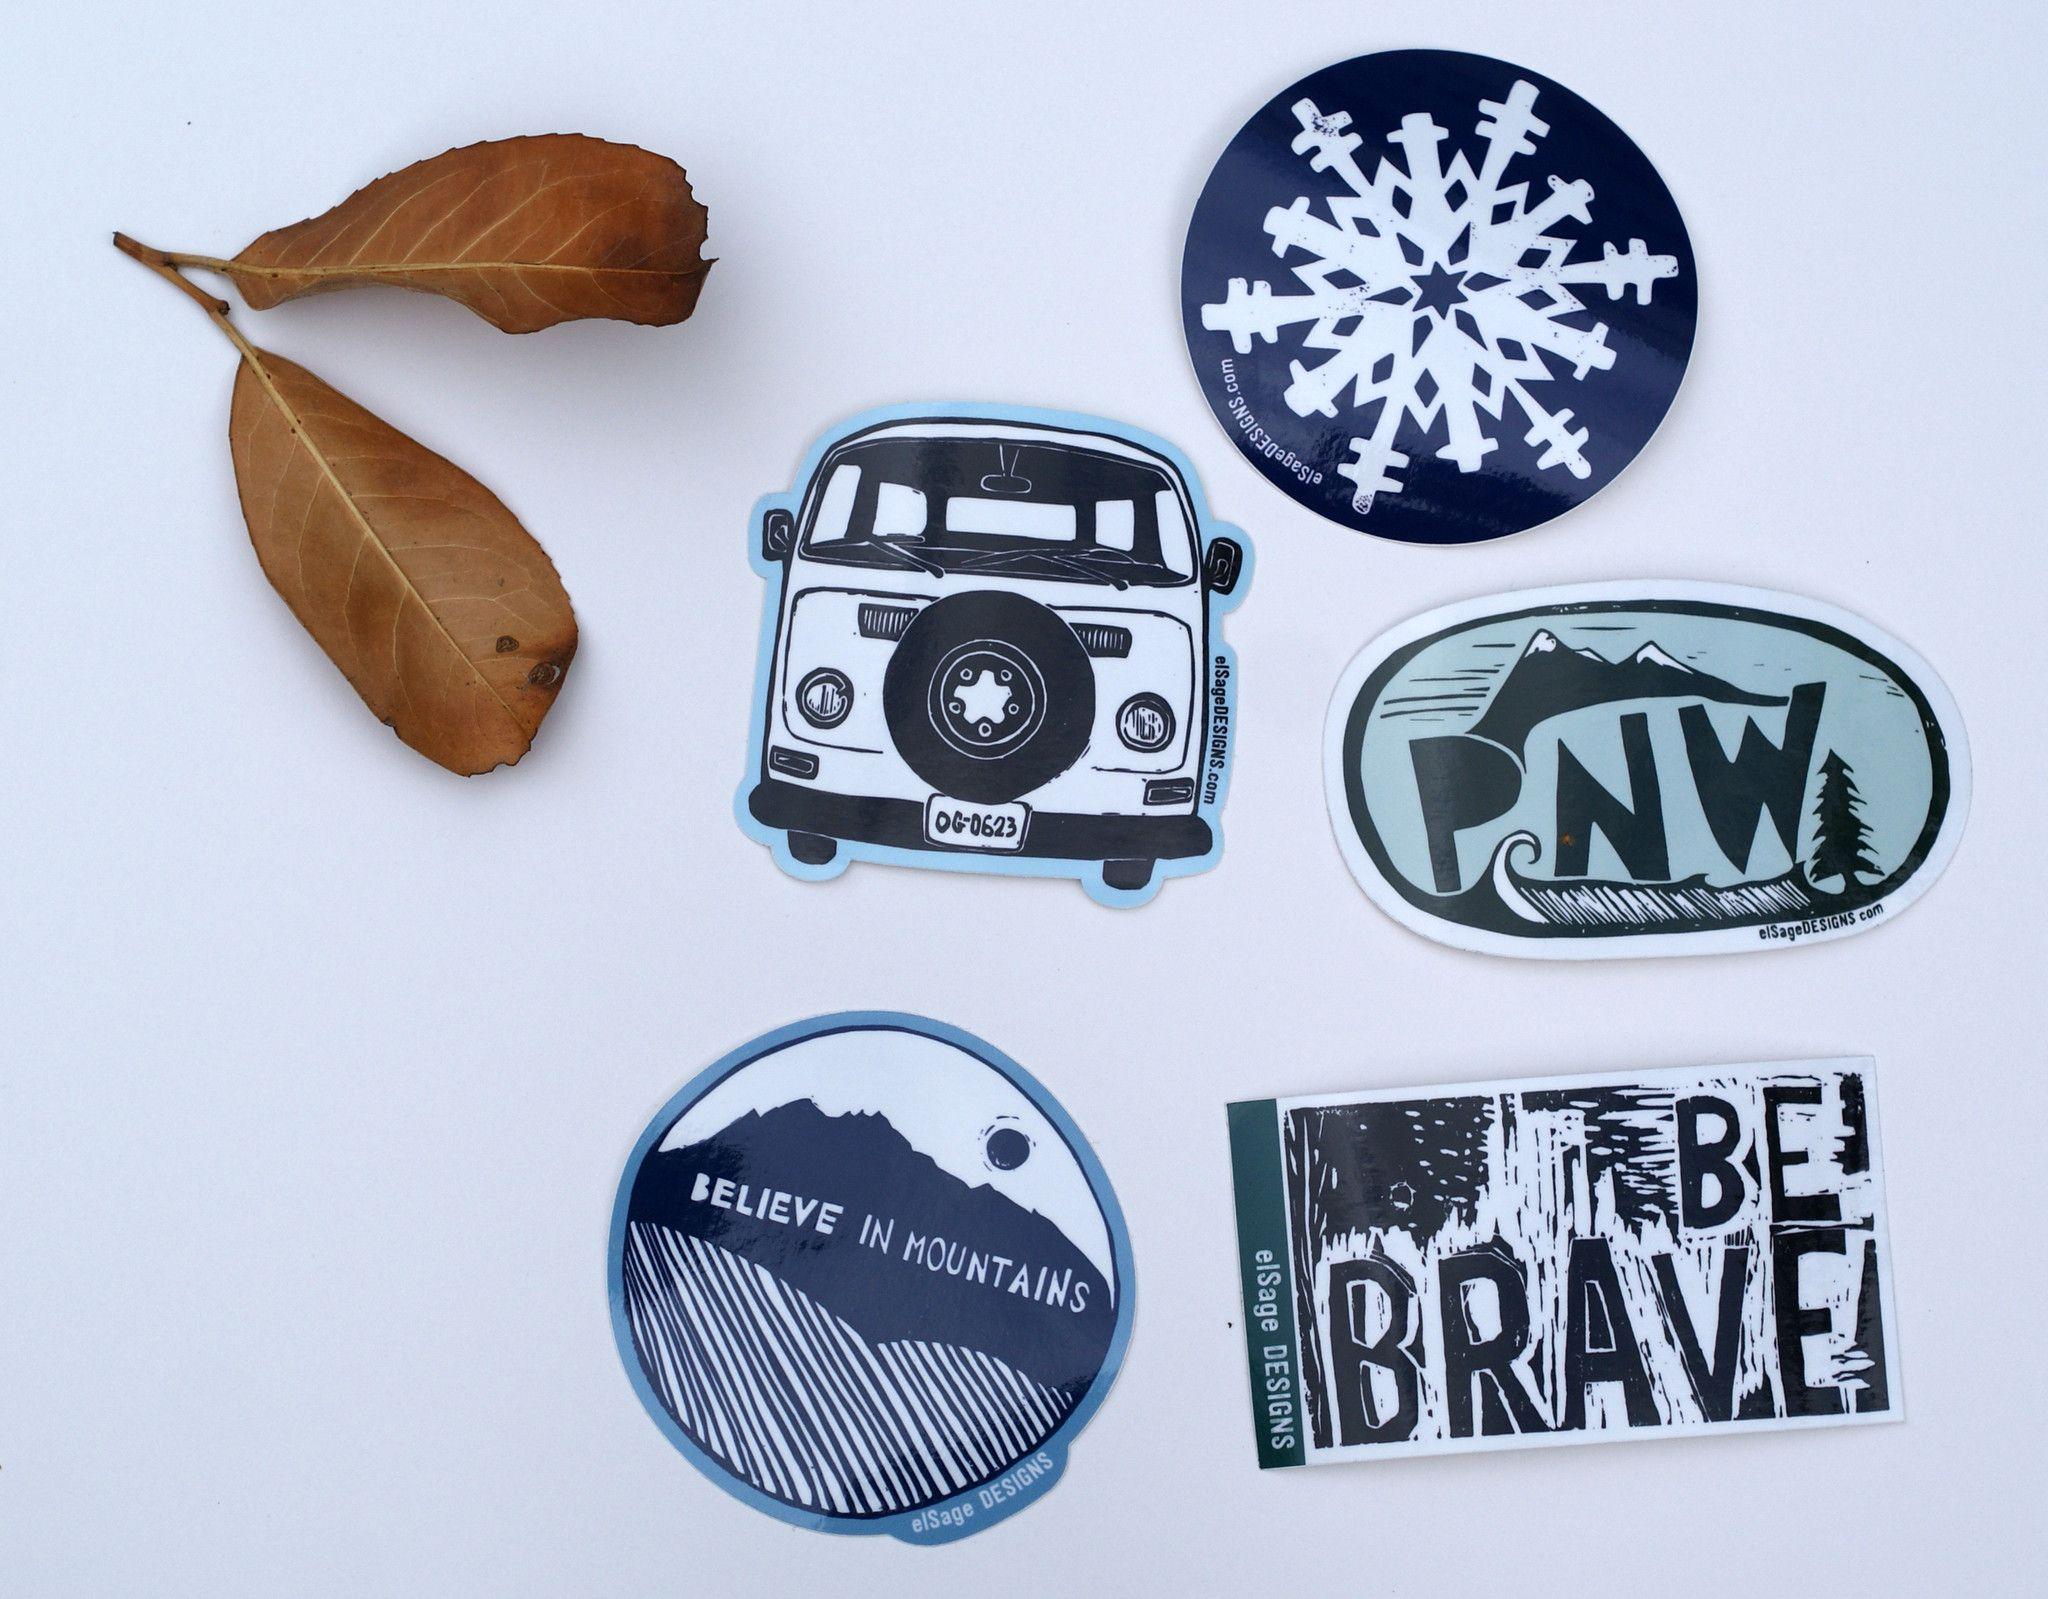 Bumper sticker design ideas - Believe In Mountains Sticker Laptop Stickersbumper Stickerssticker Designsfall